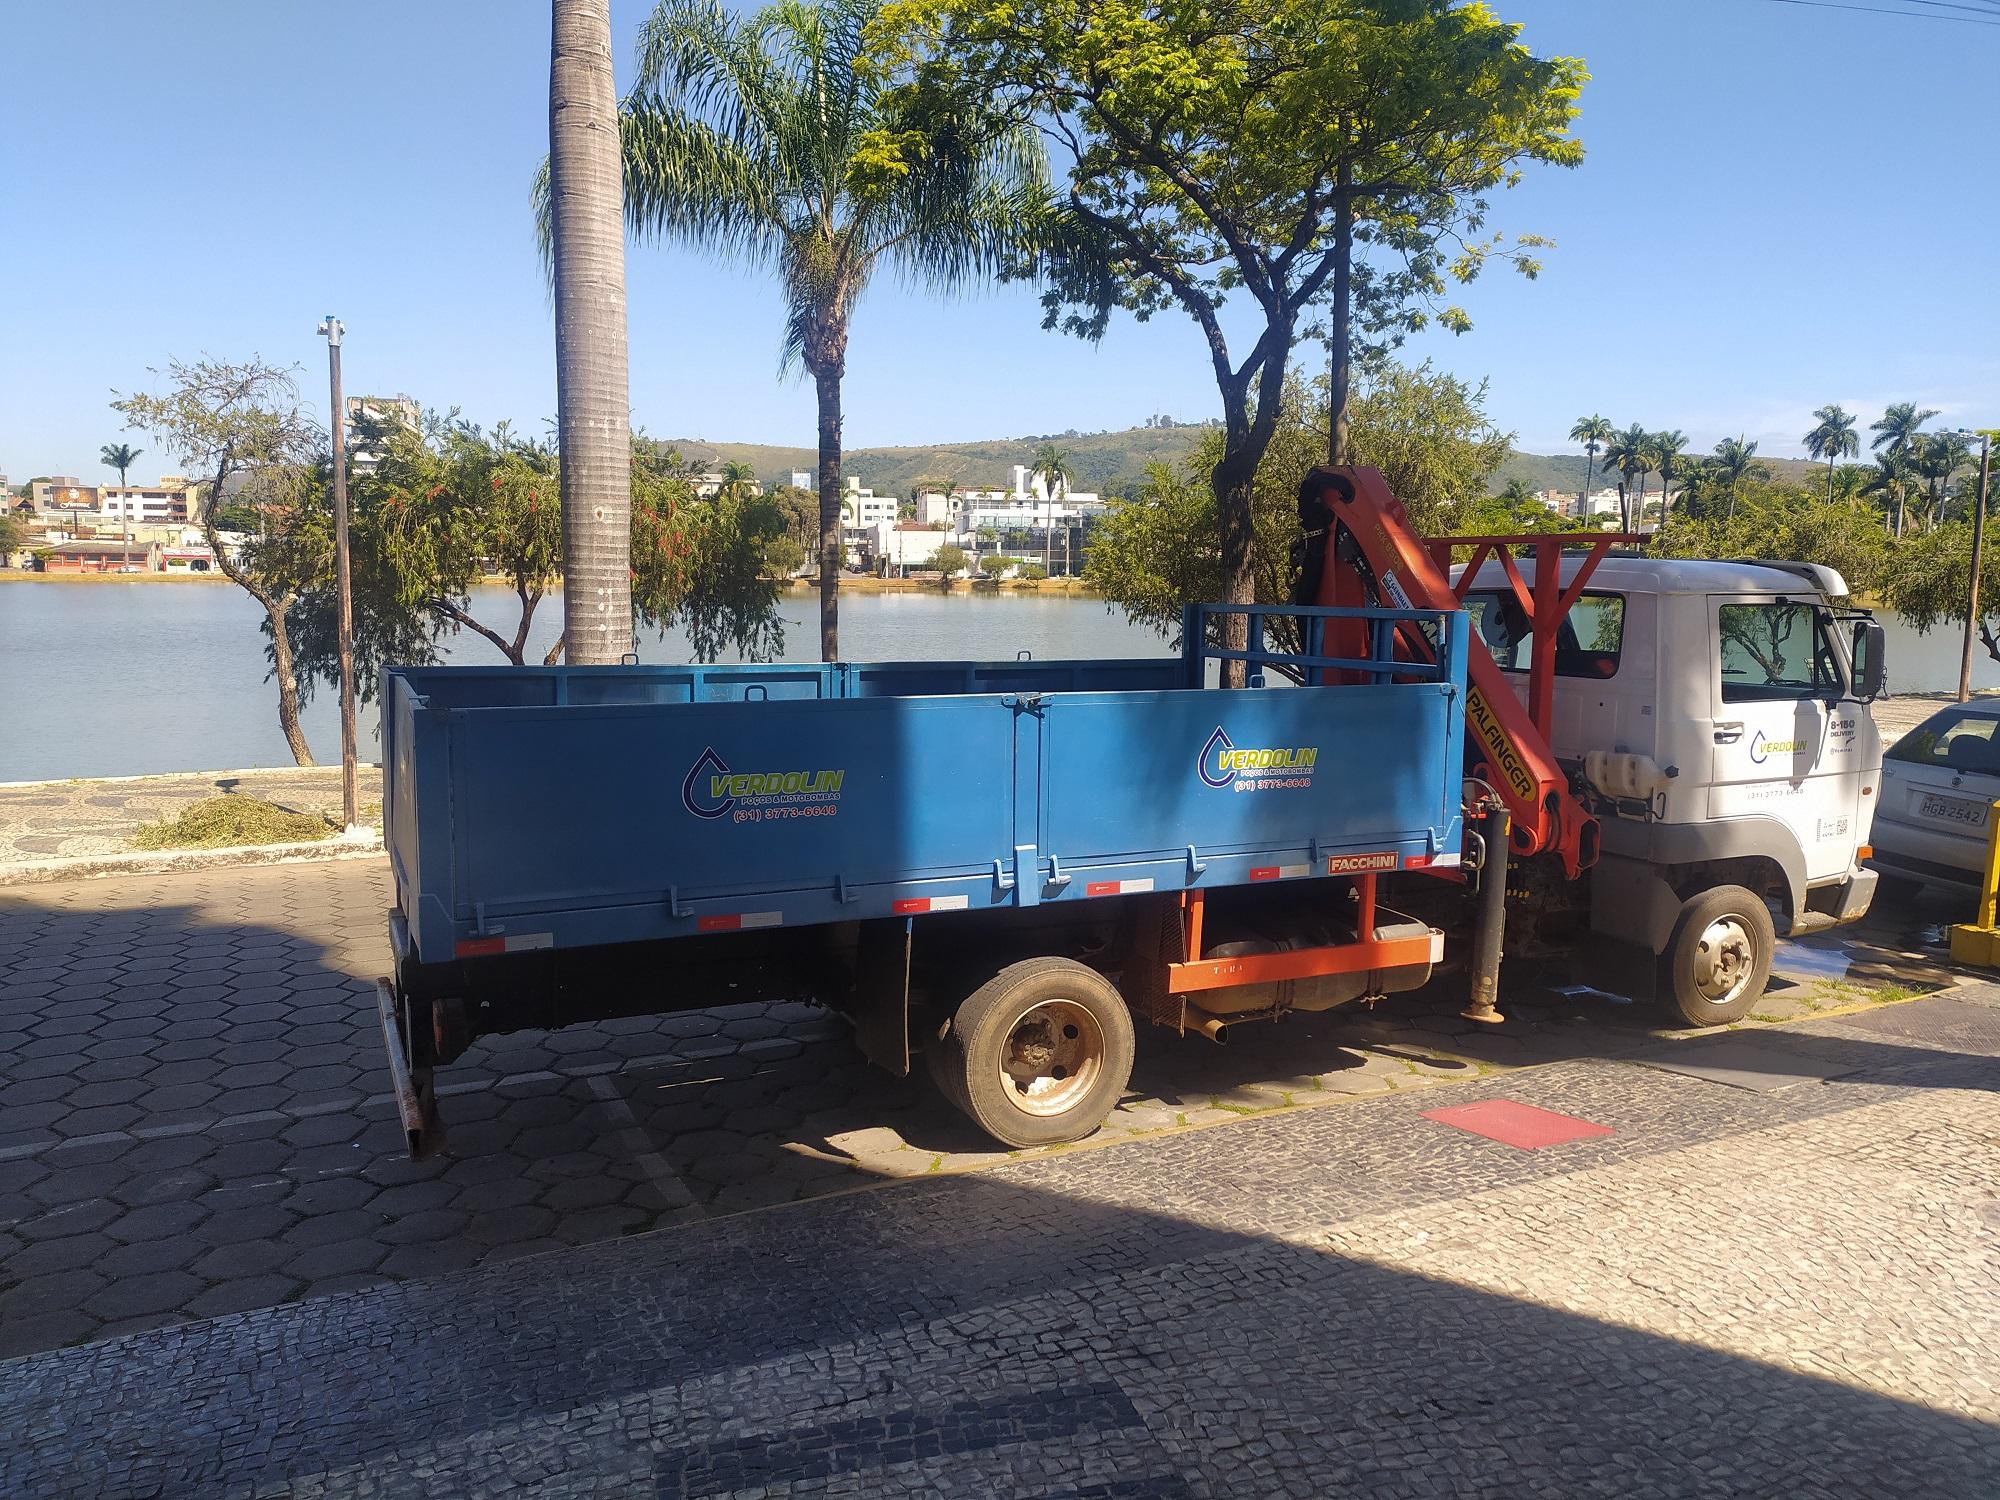 SERVIÇO DE LIMPEZA DE POÇO ARTESIANO